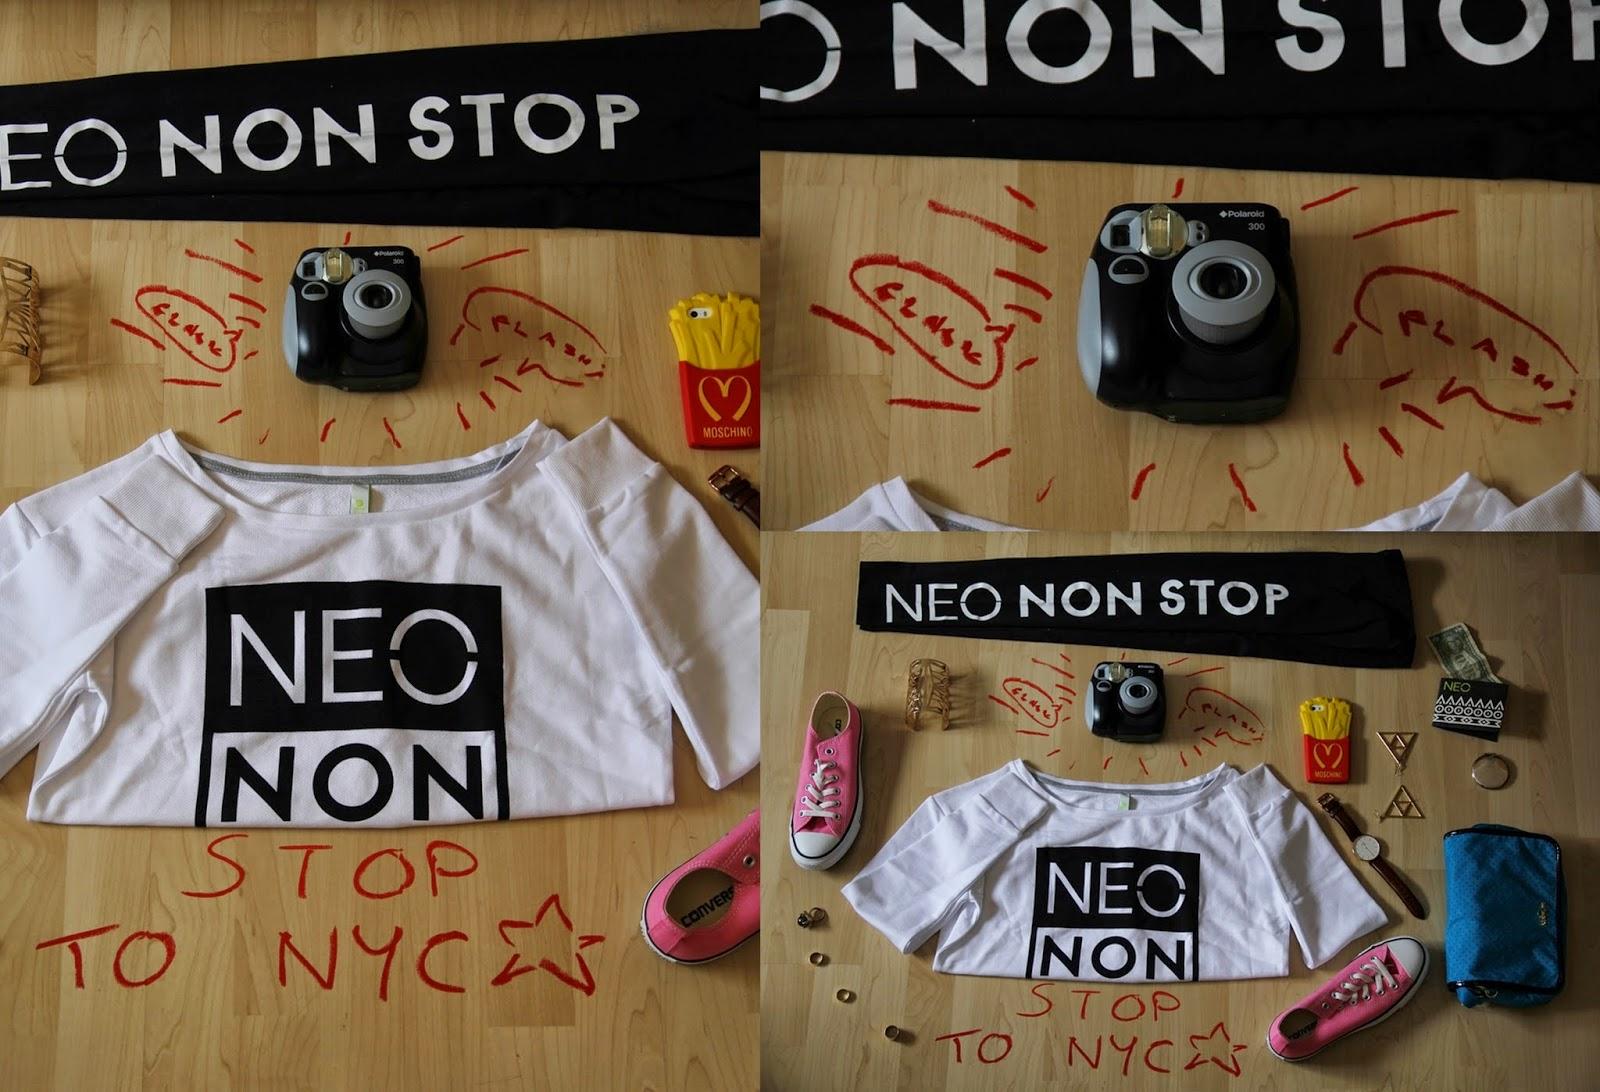 neononstop new york fashion show